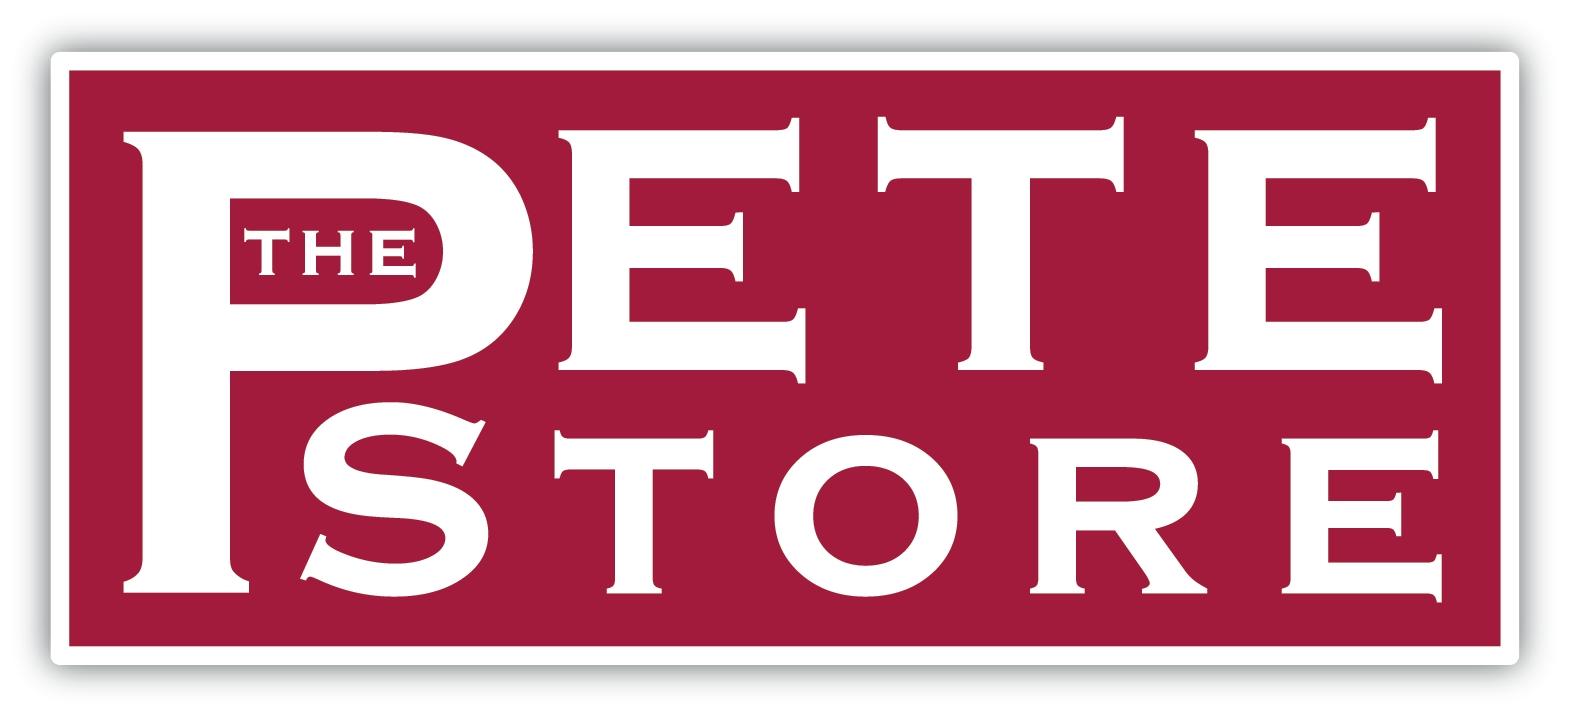 Thepetestoremaster on Peterbilt Logo